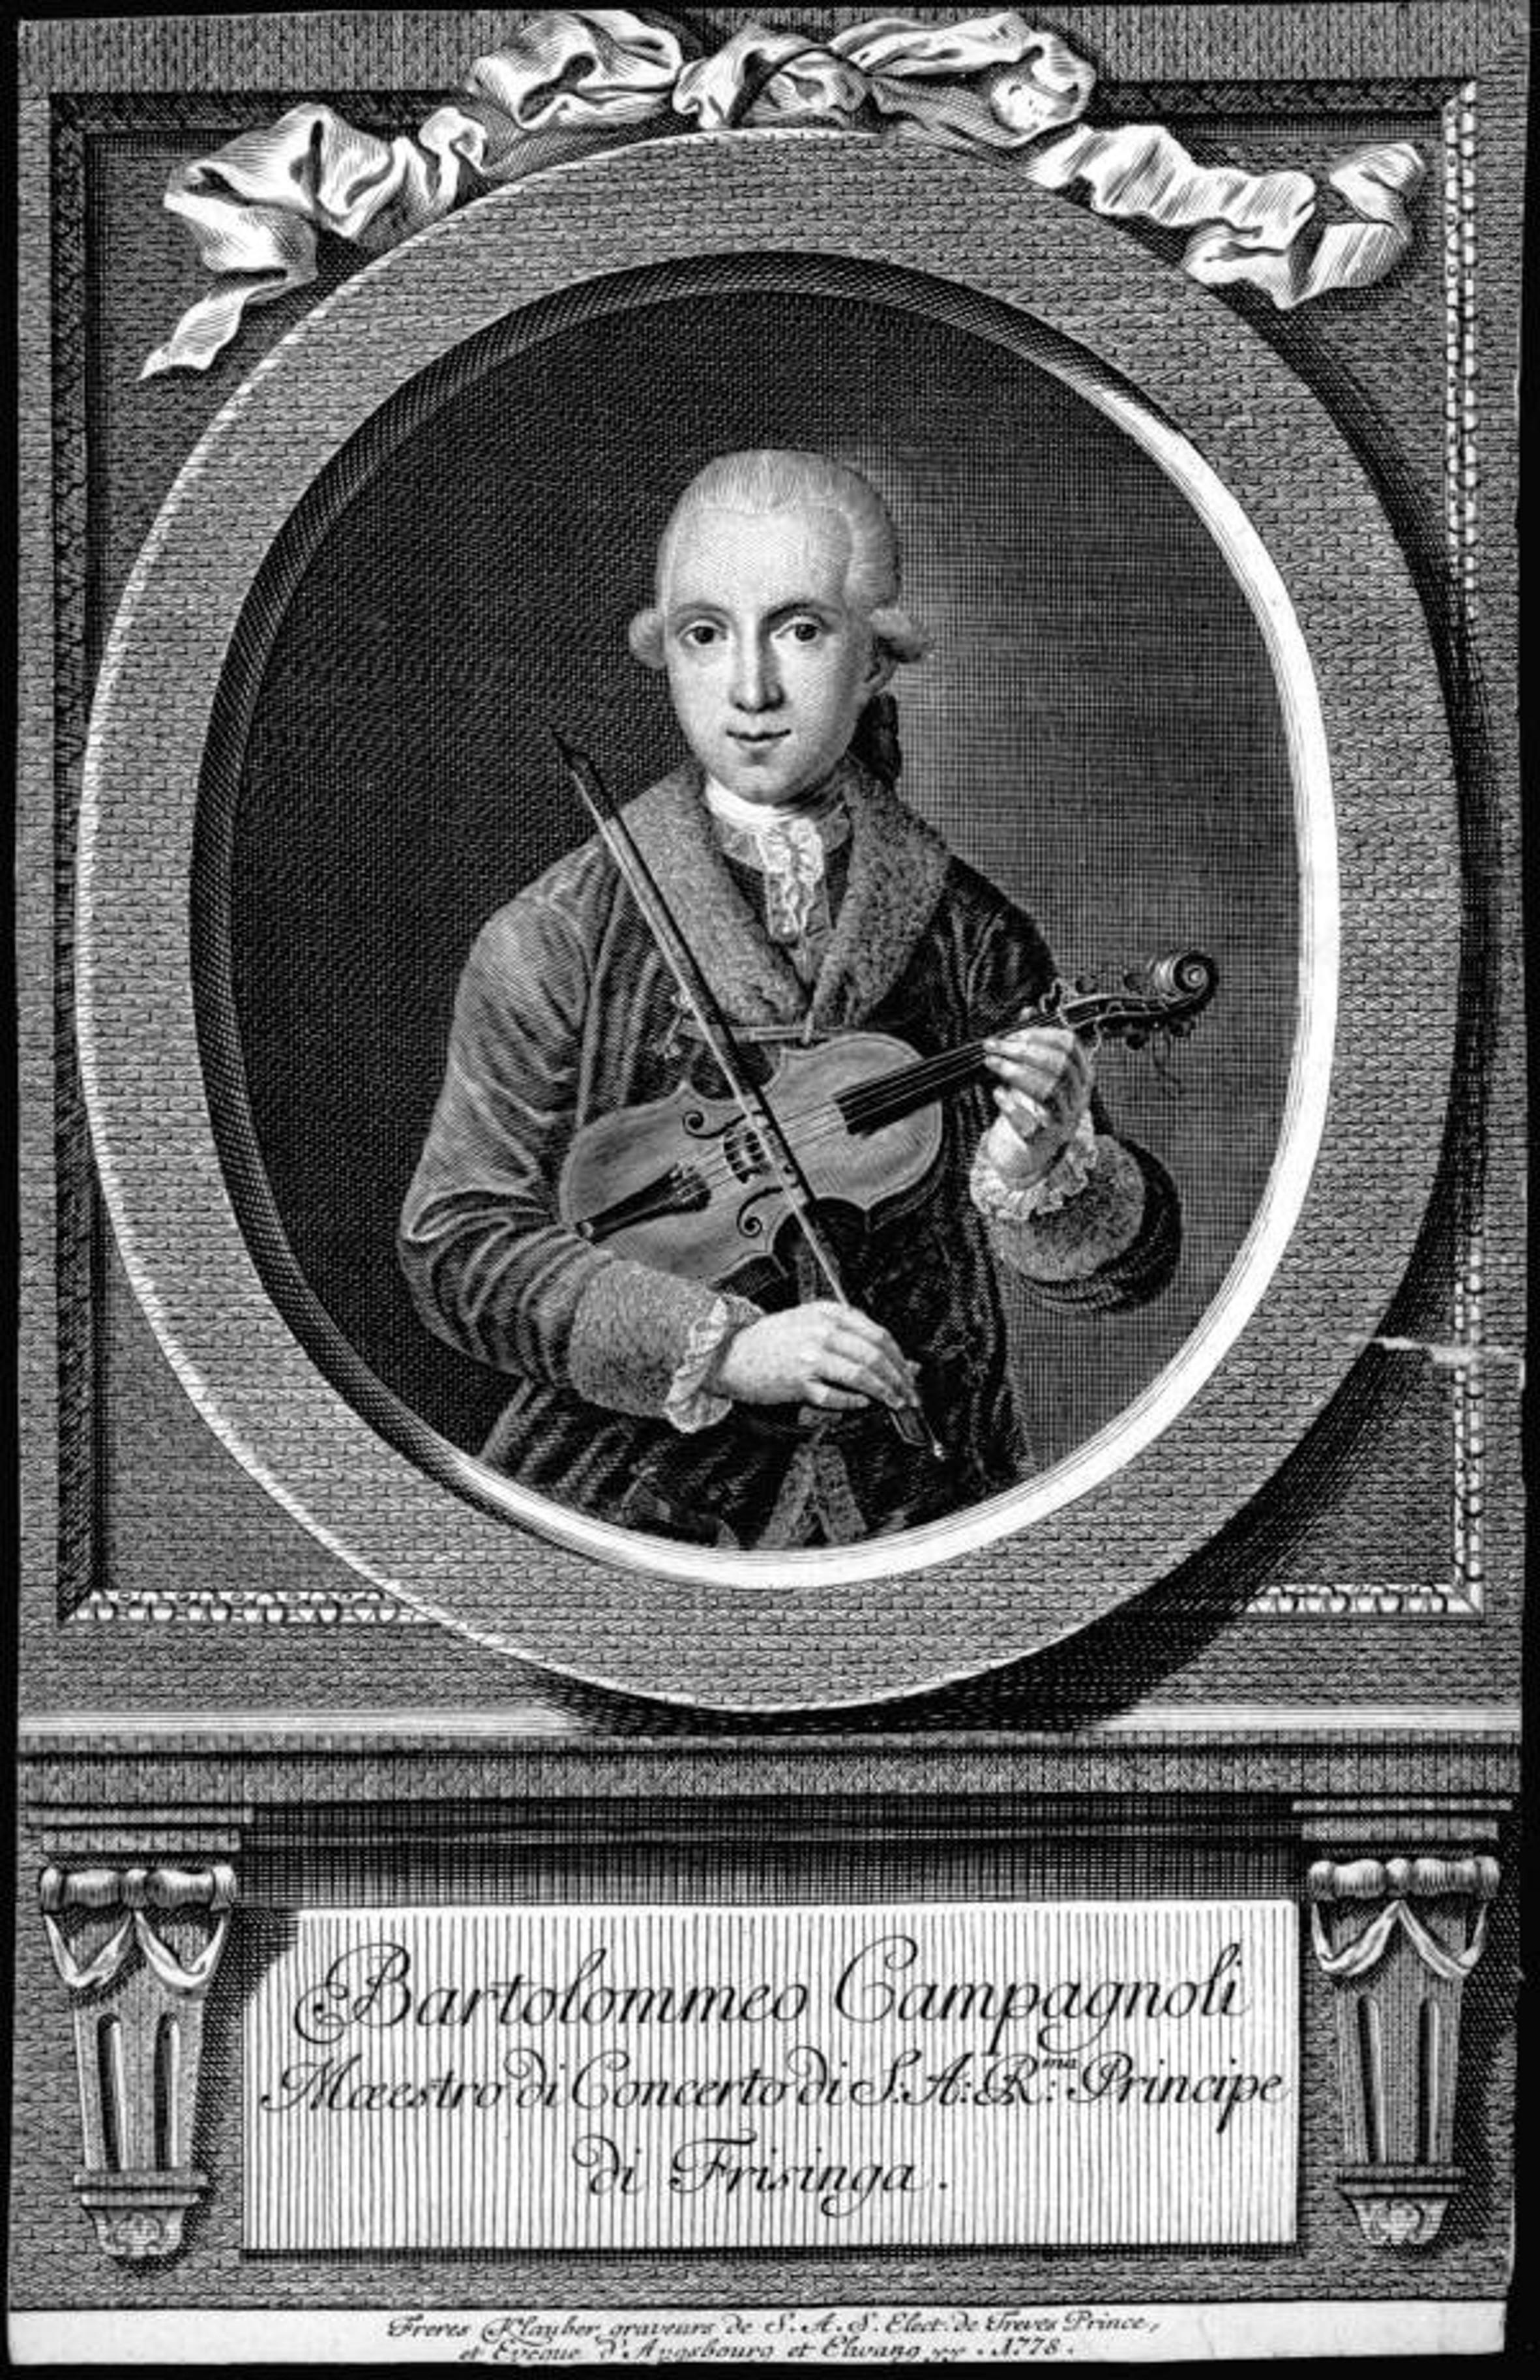 Bartolomeo Campagnoli